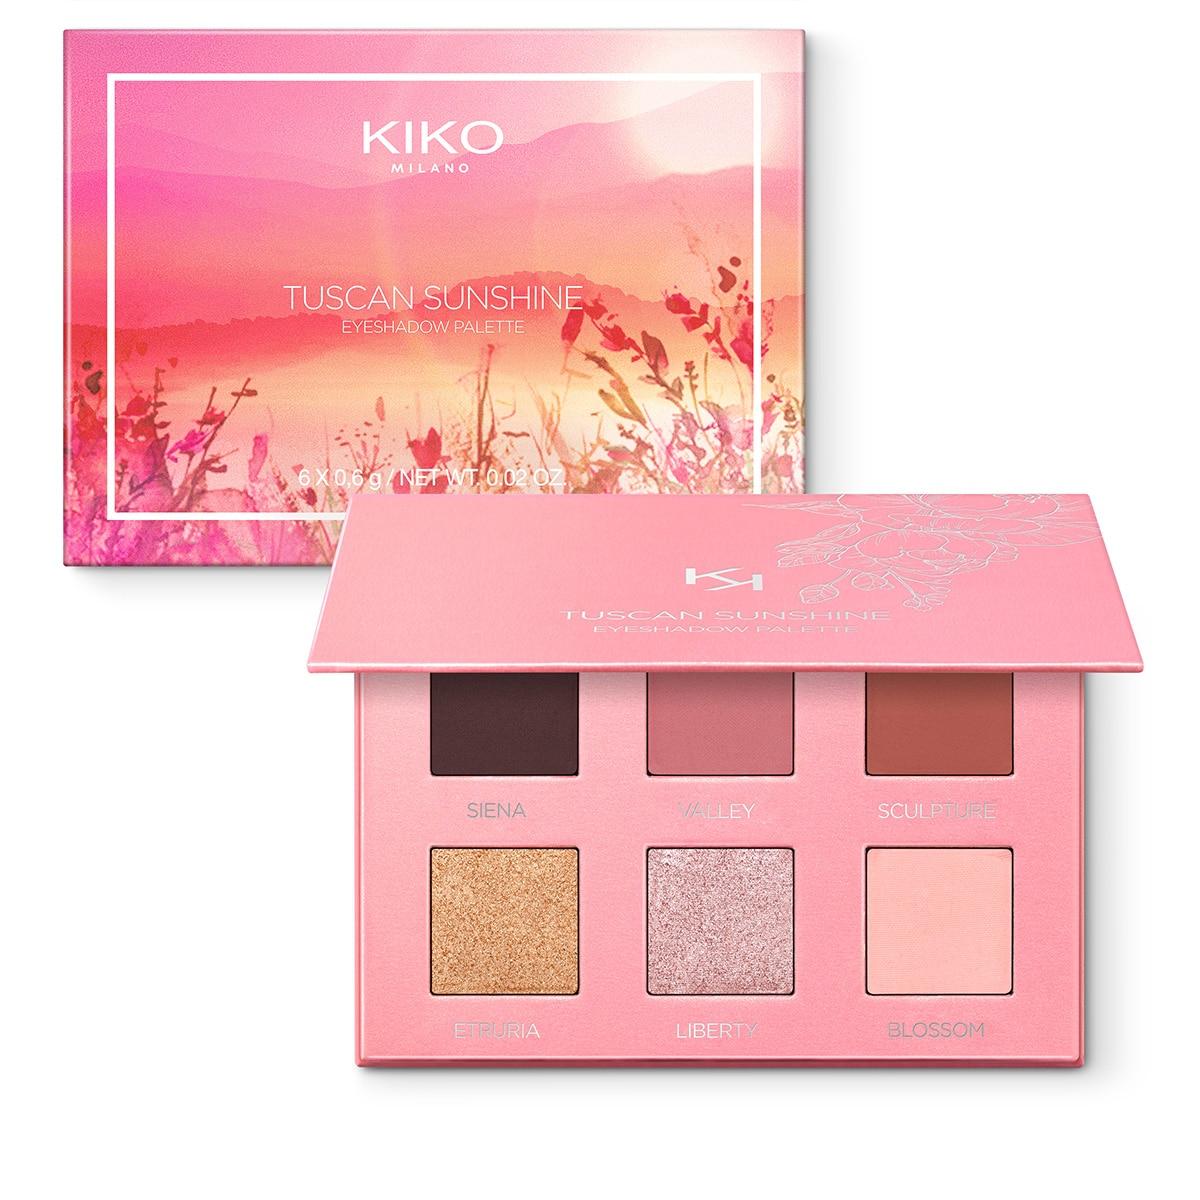 KIKO MIlano Tuscan Sunshine Eyeshadow Palette